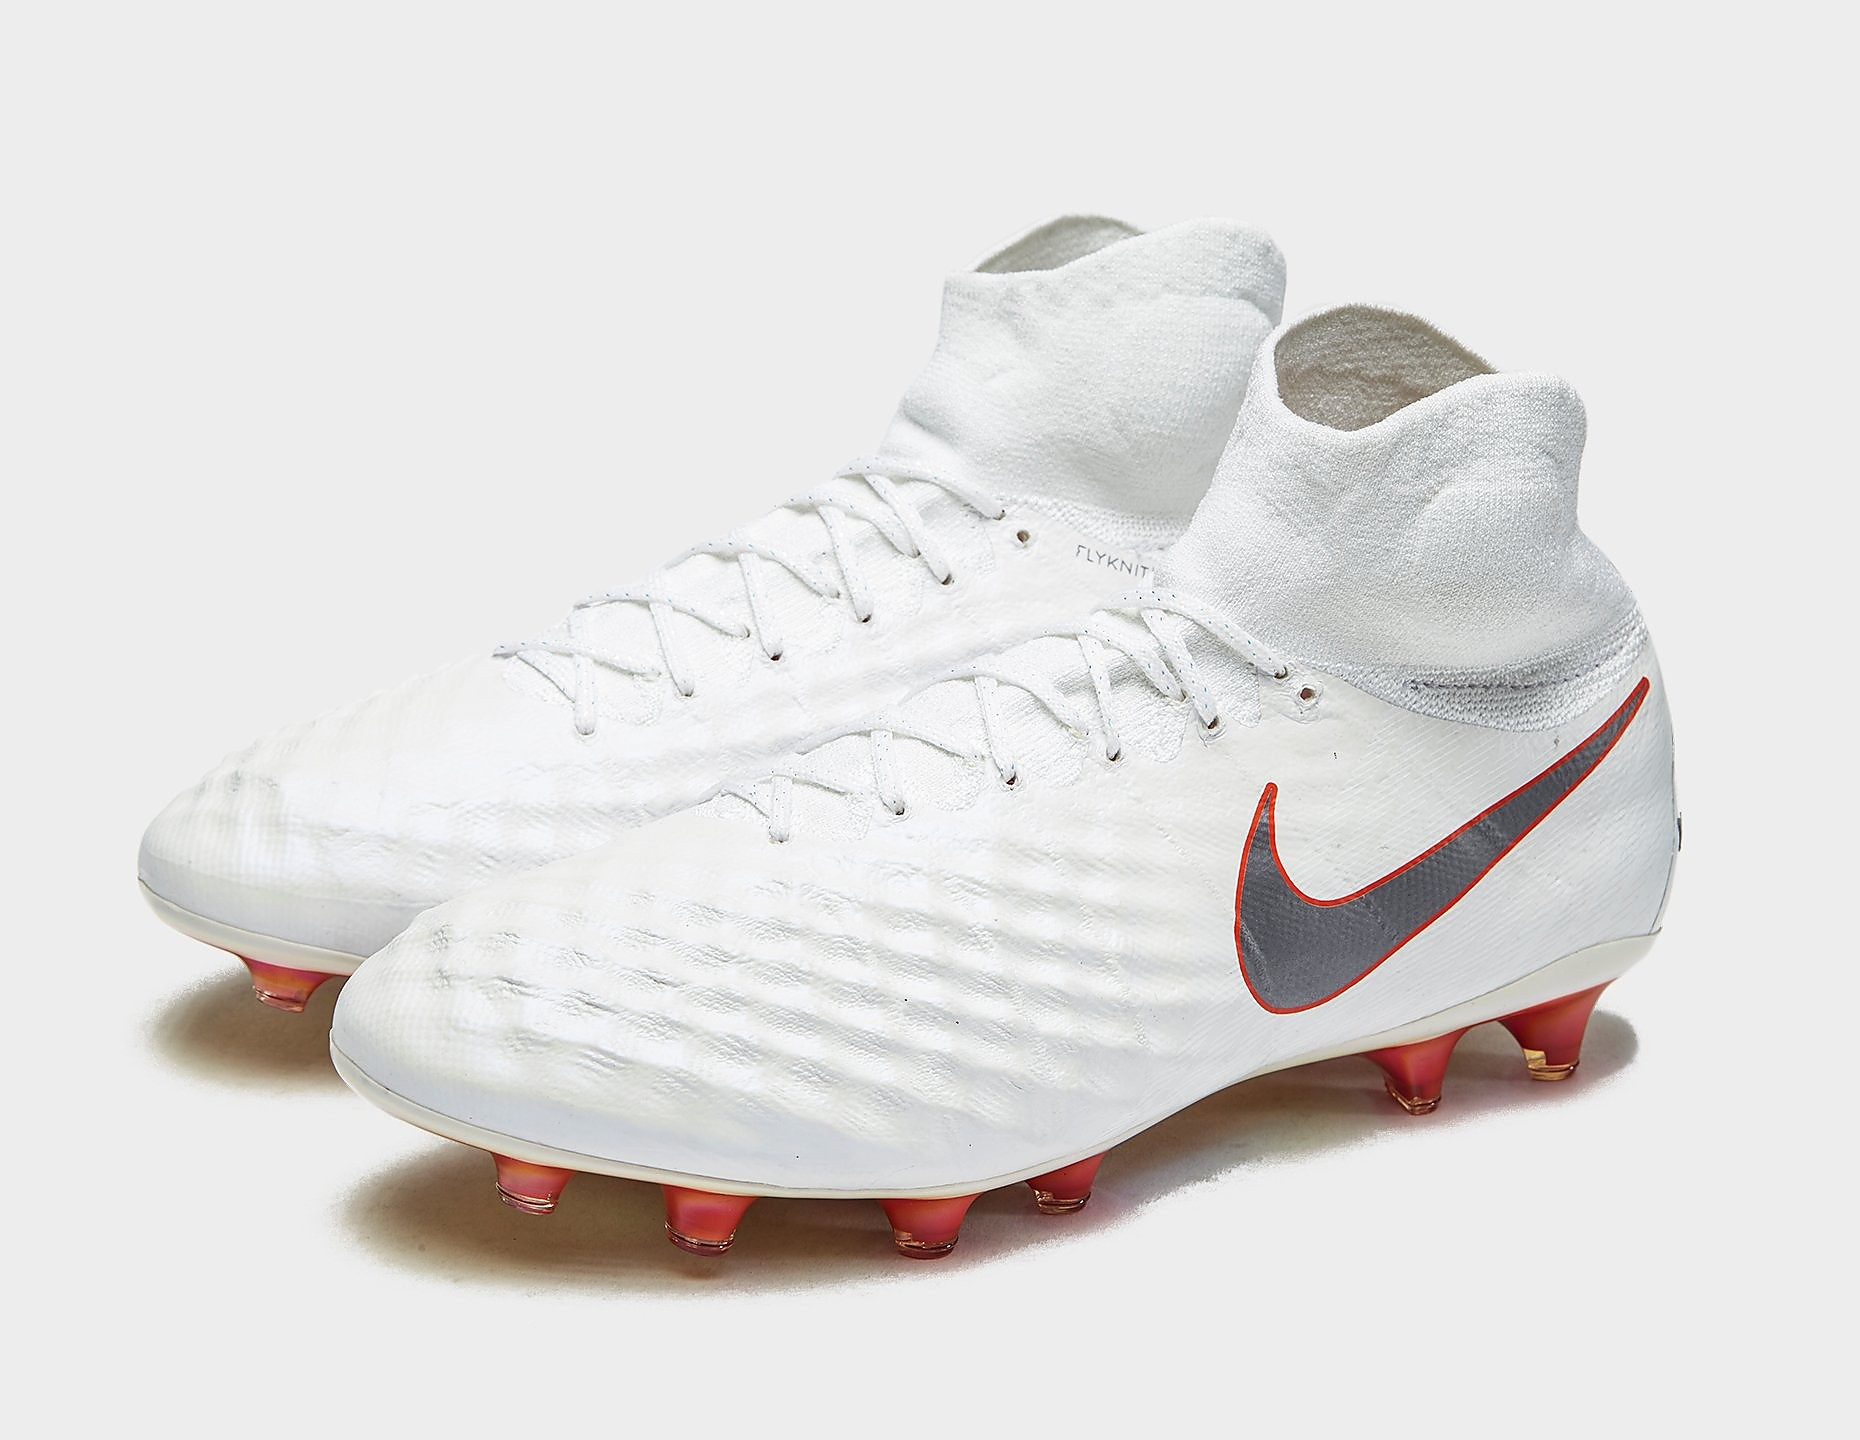 Nike Just Do It Magista Elite Dynamic Fit FG